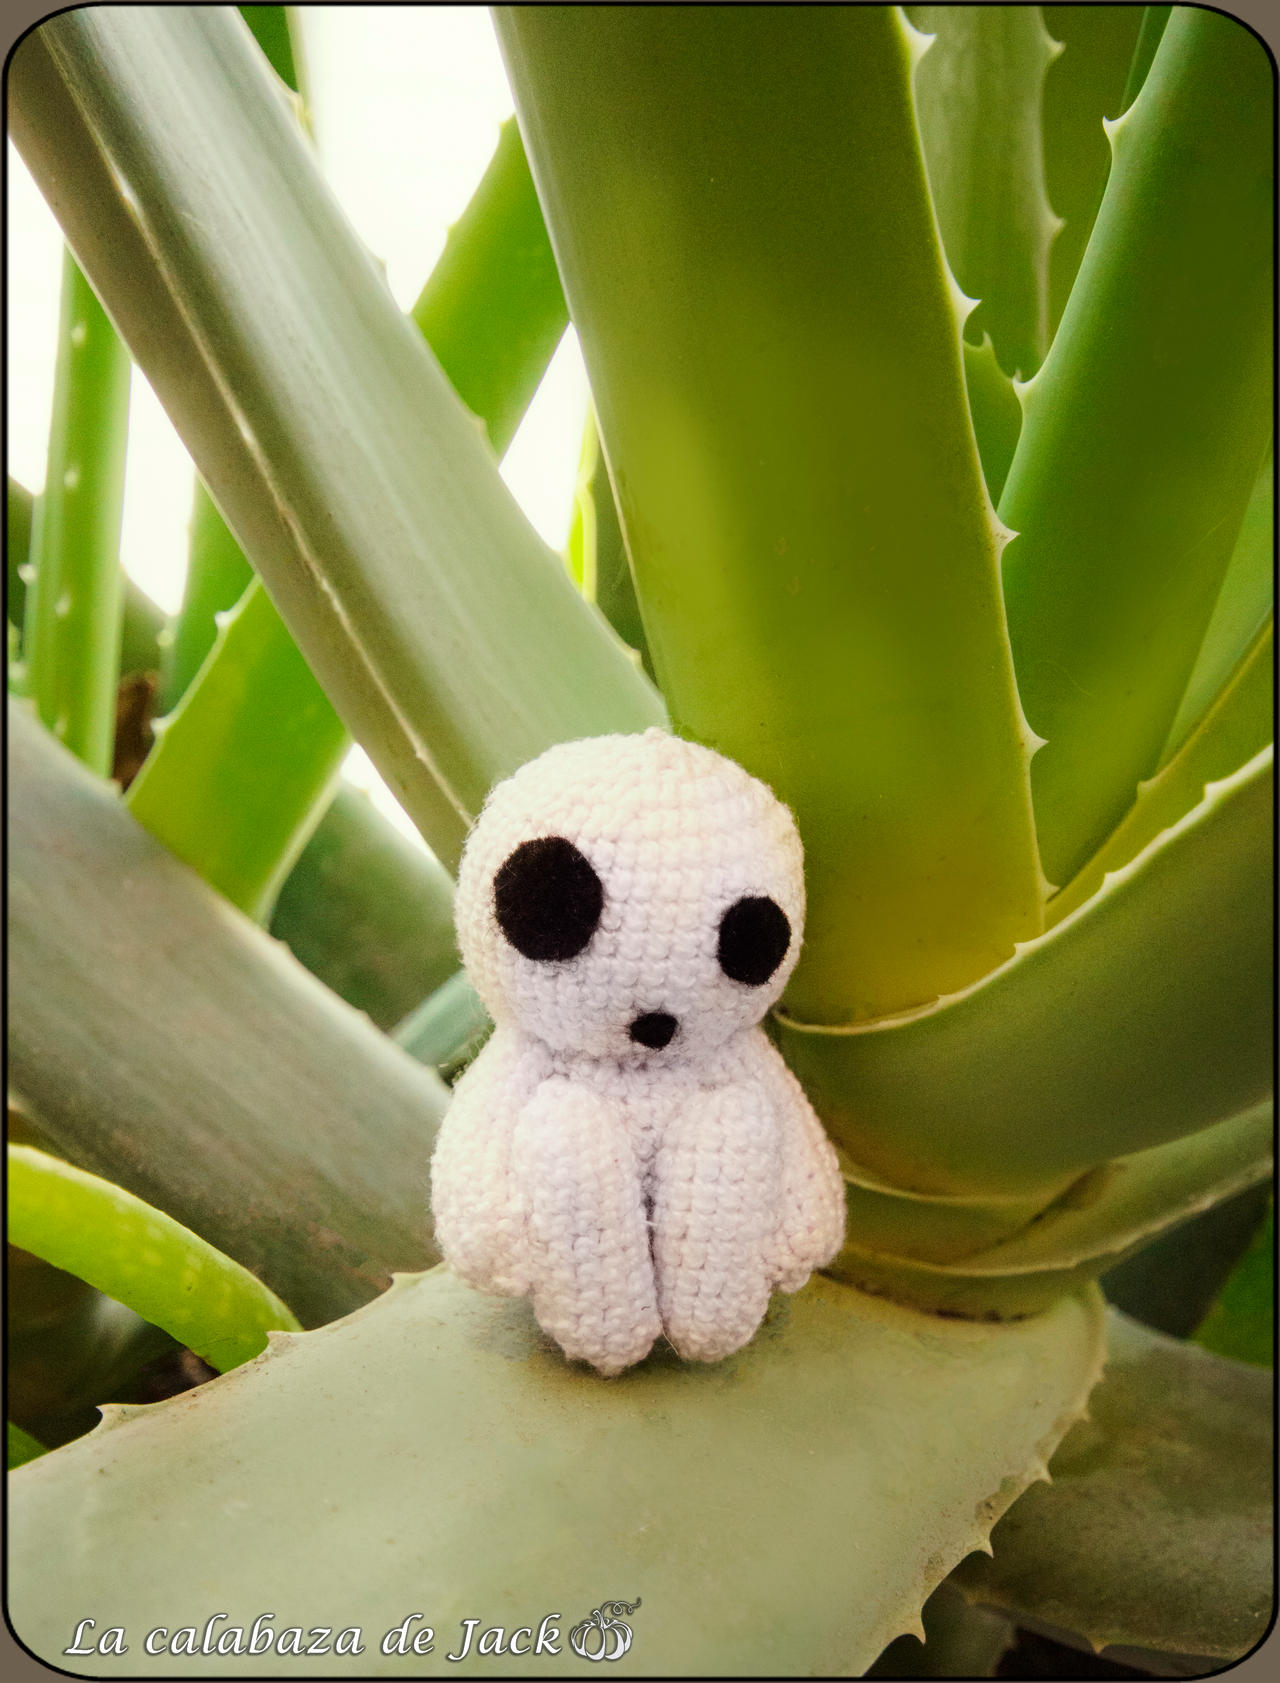 Kodama amigurumi pattern crochet | Etsy | 1683x1280